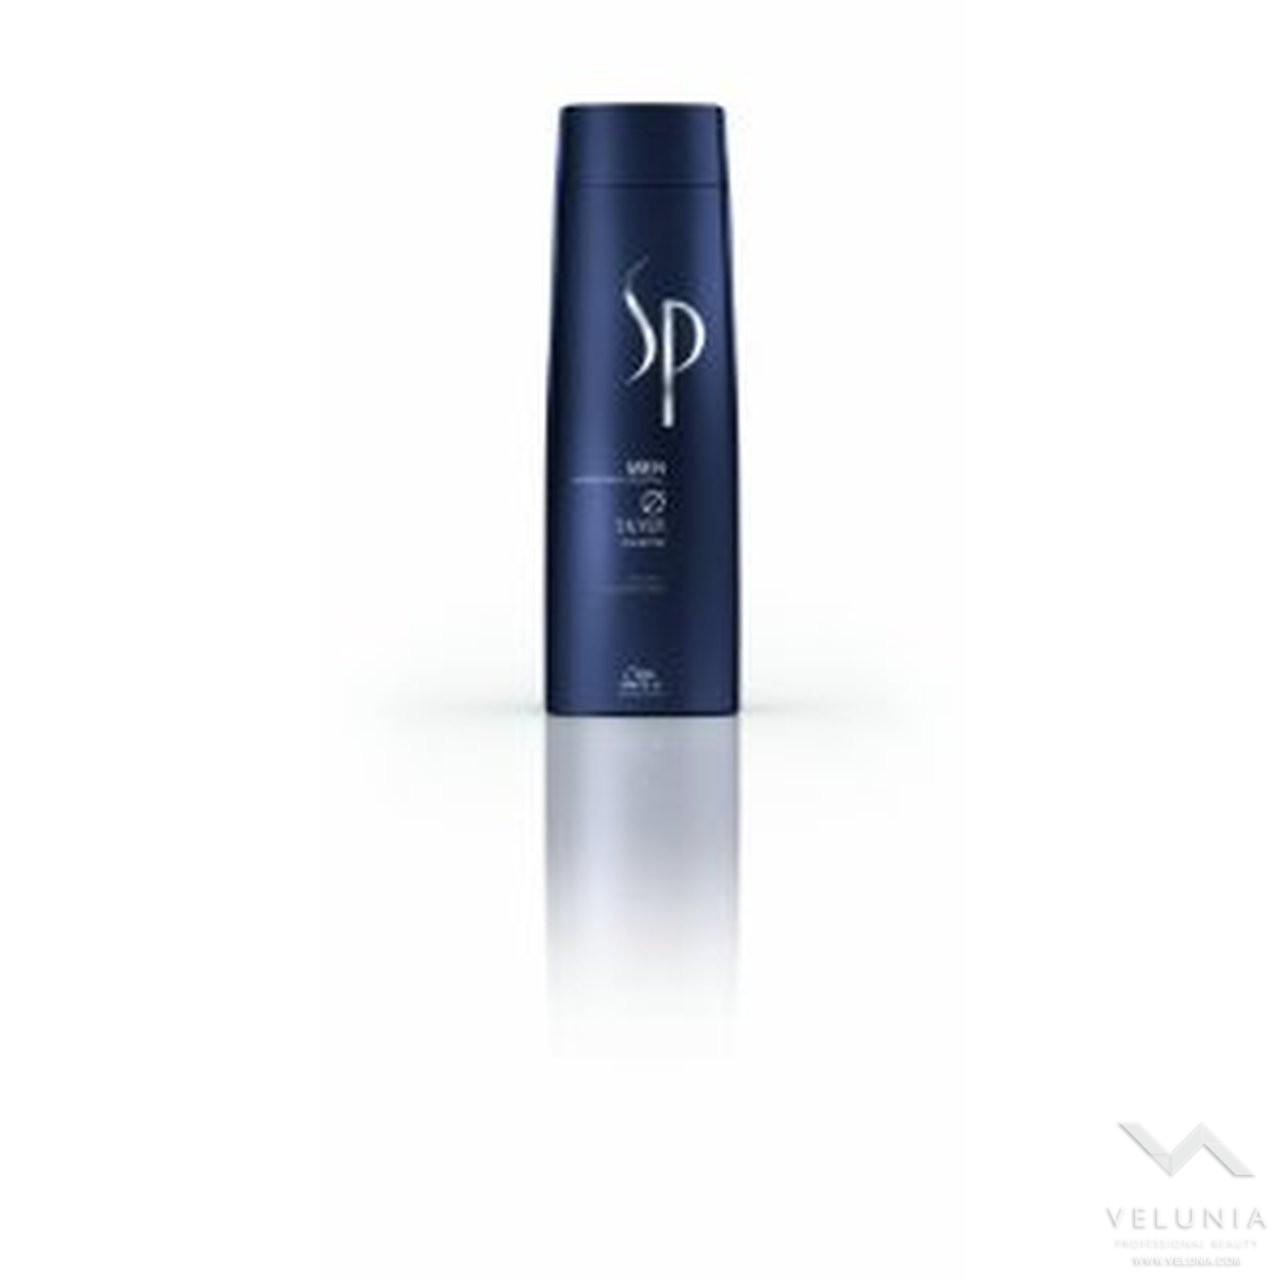 Wella sp System Professional Men Silver Shampoo 200ml 1